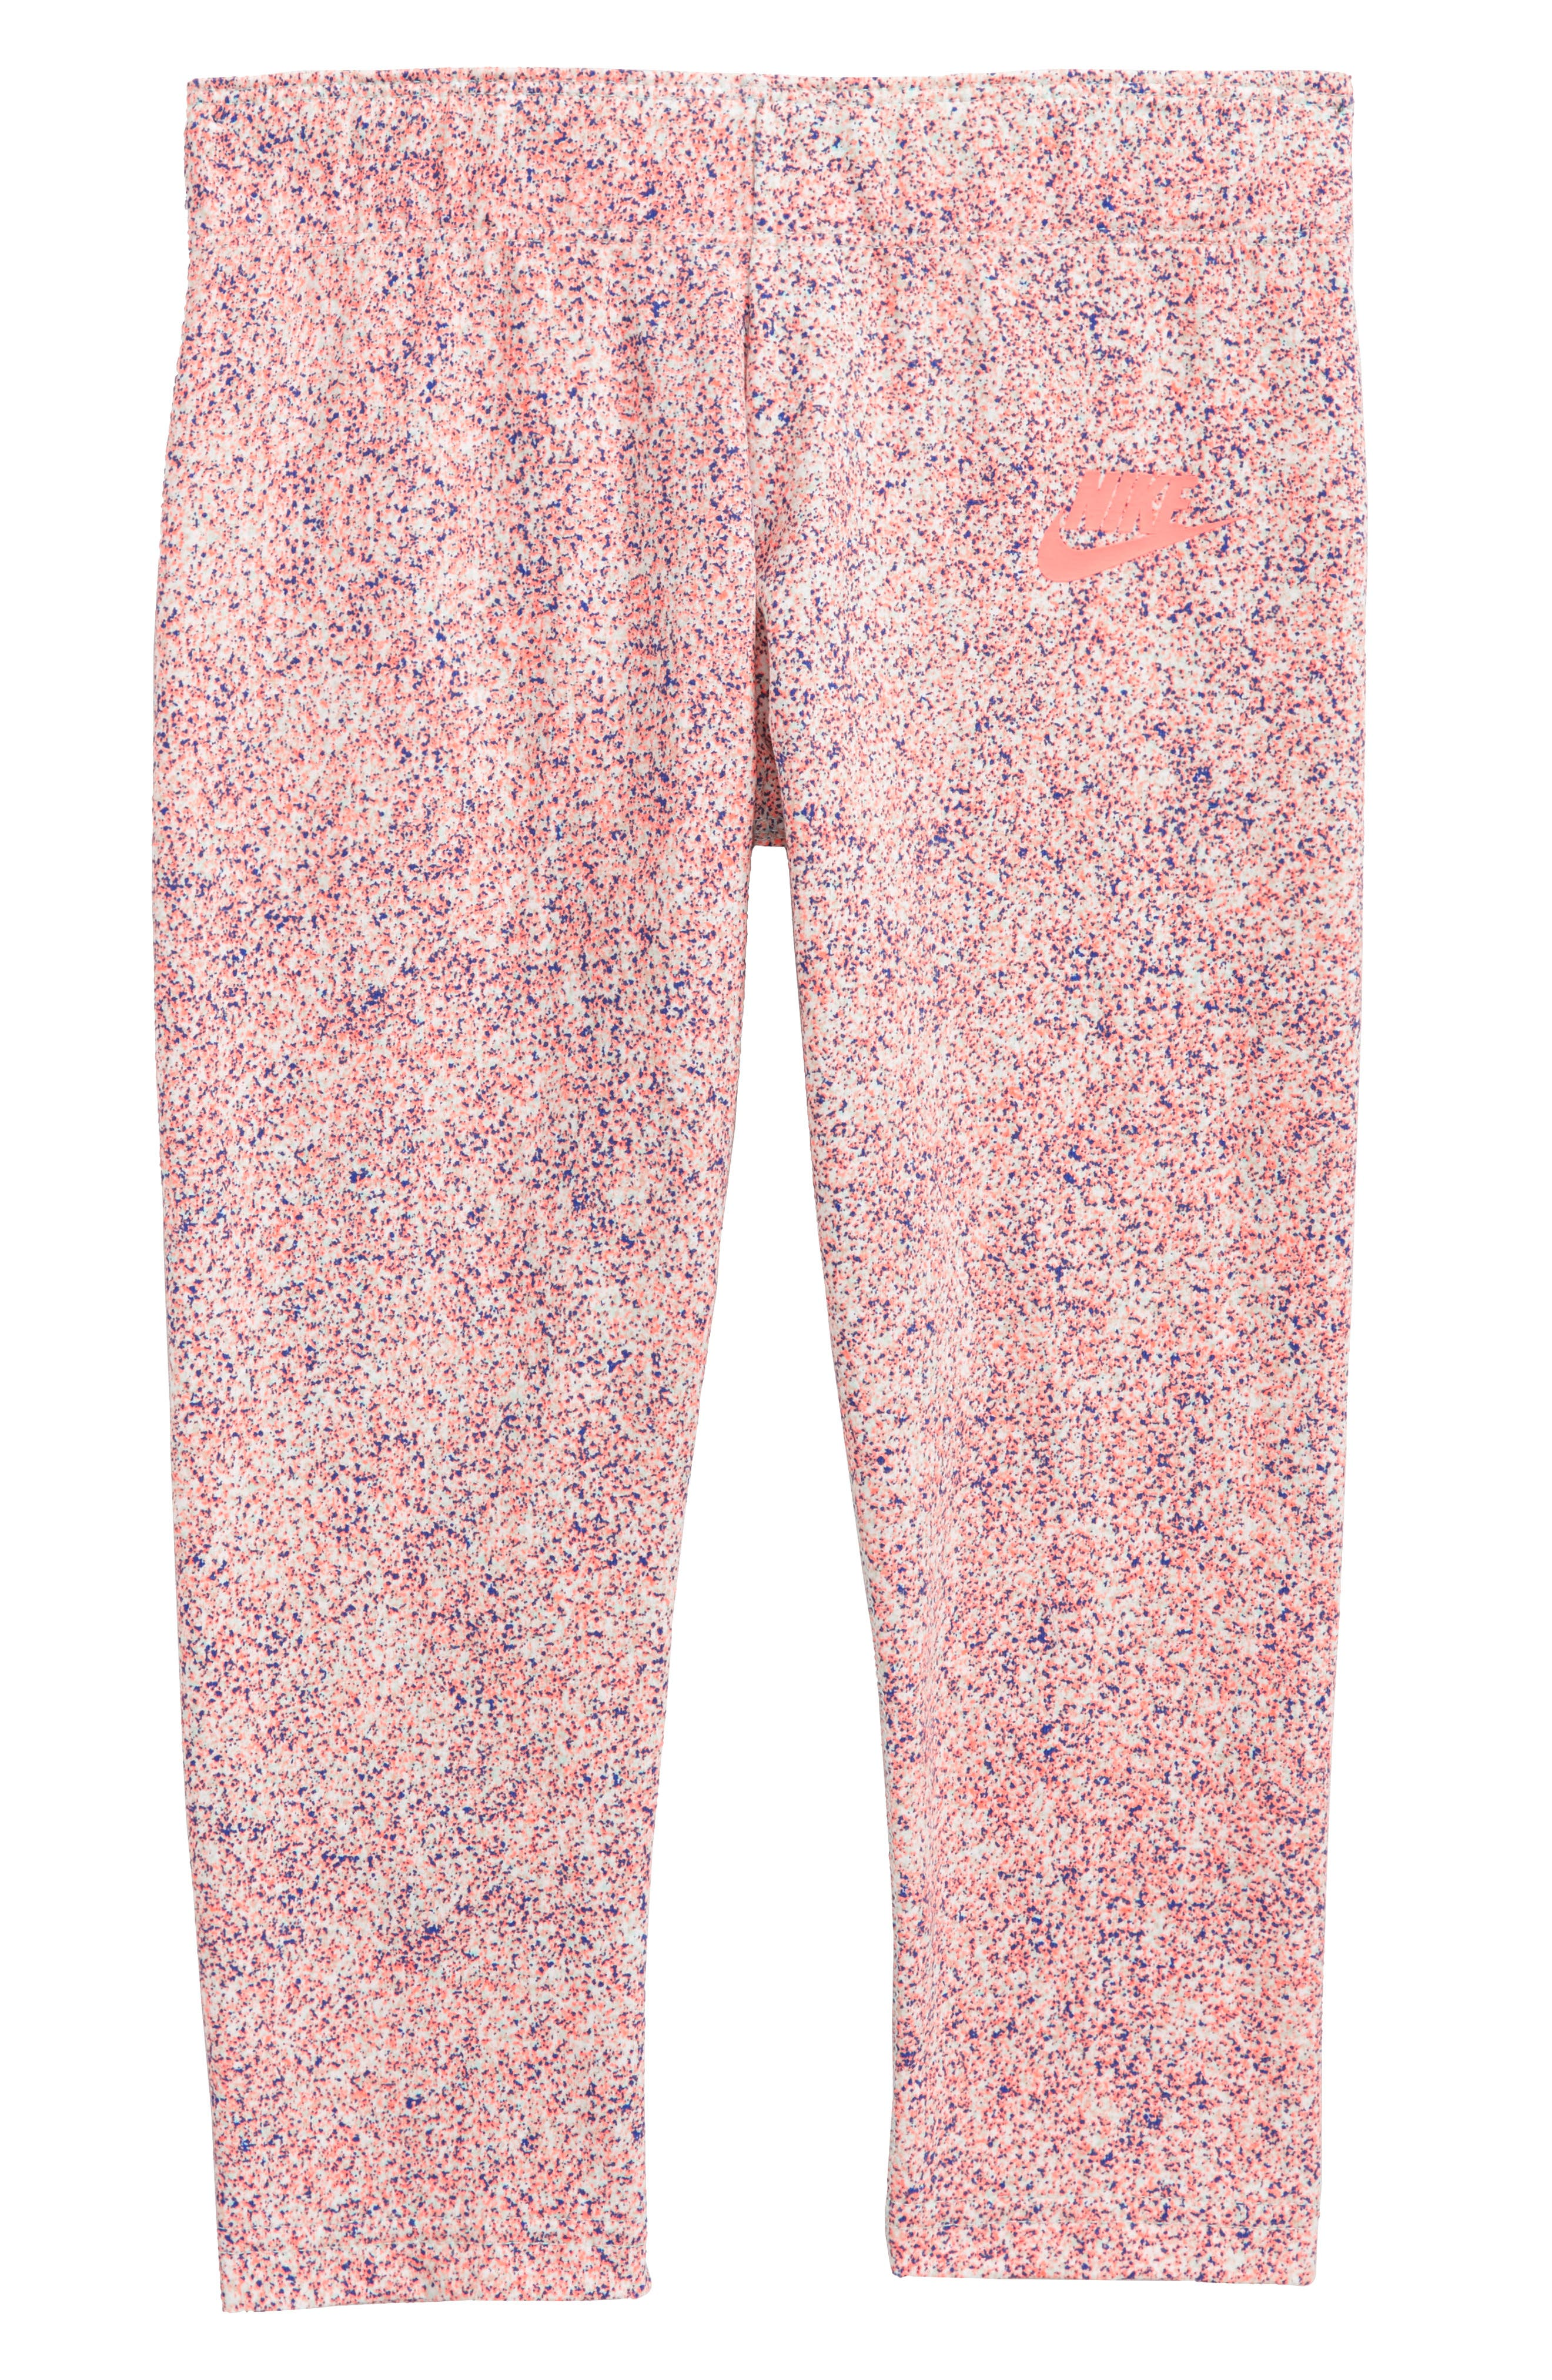 Sportswear AOP Crop Leggings,                         Main,                         color, 814